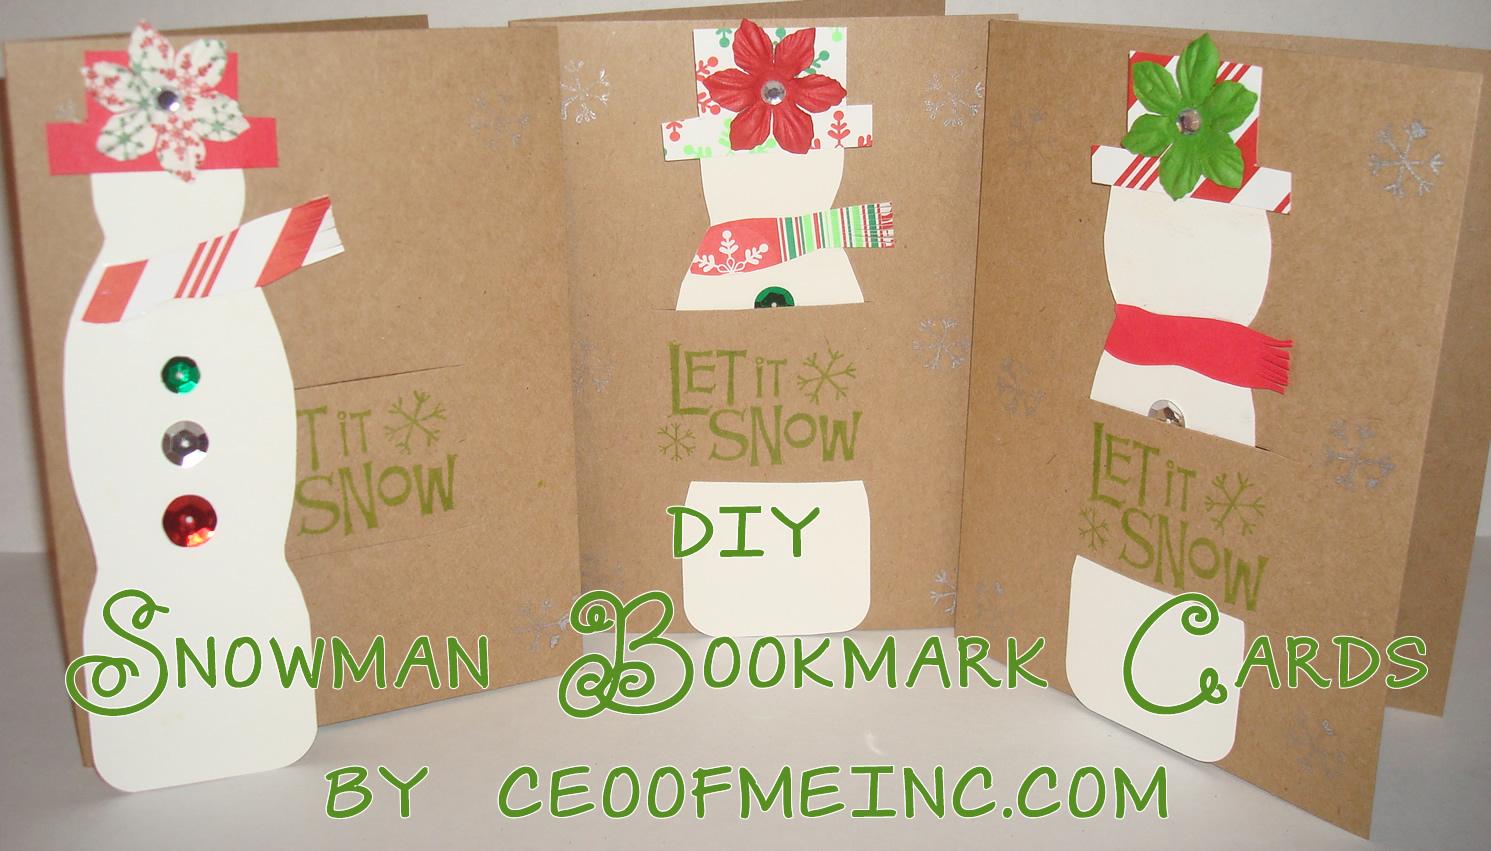 Diy Christmas Cards Snowman Bookmark Diy Christmas Card Craft Tutorial